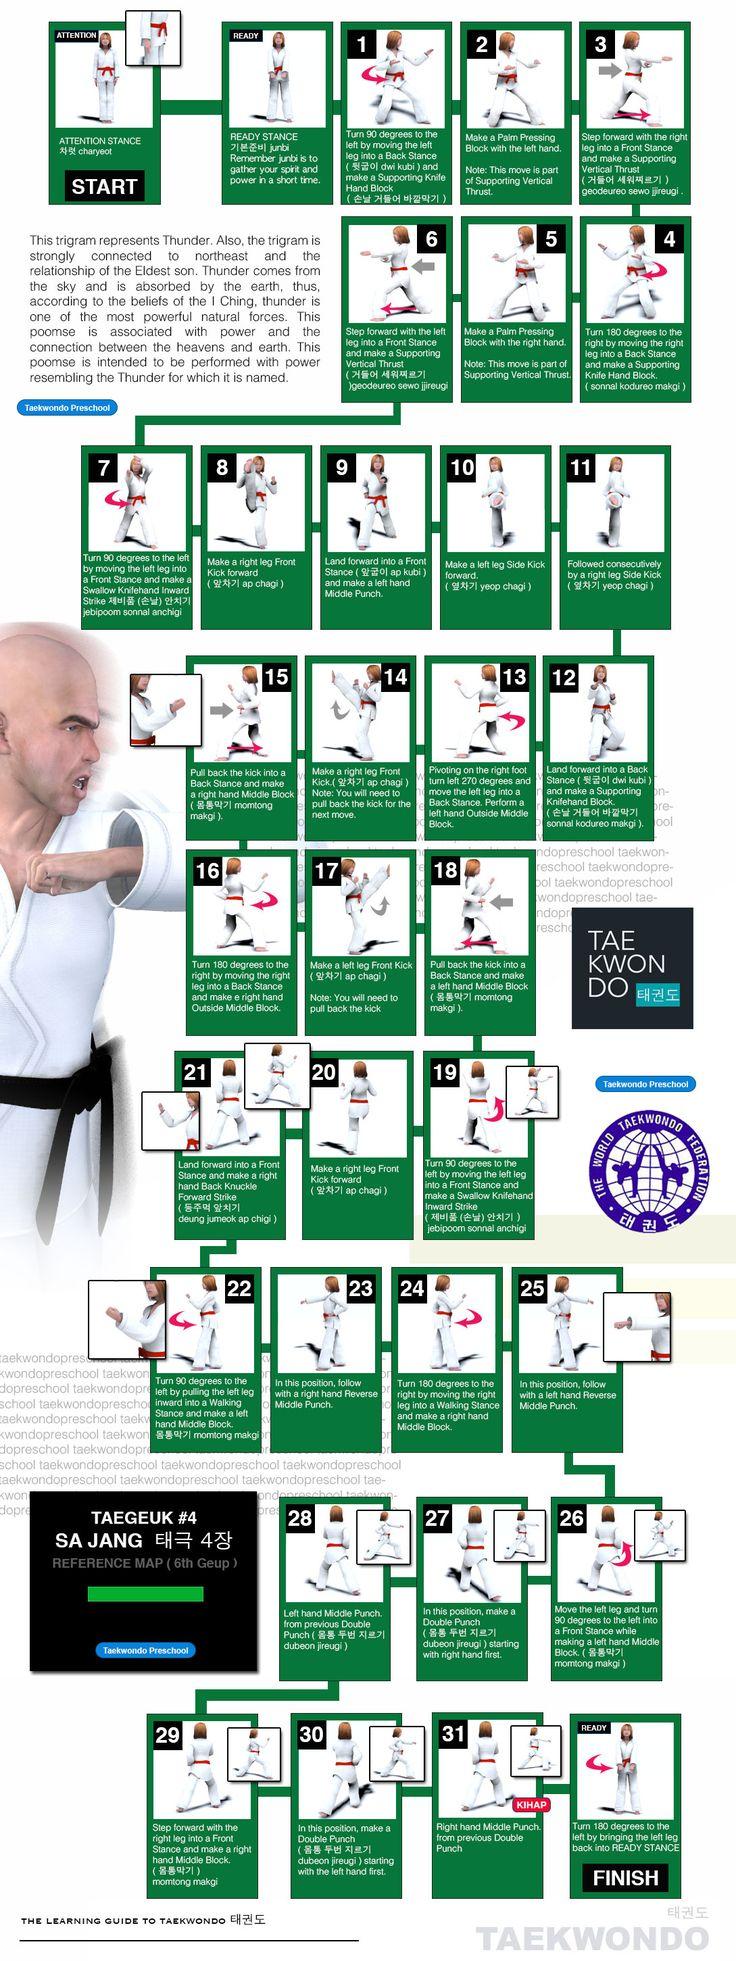 9 best taekwondo wtf images on pinterest martial artists taegeuk 4 taegeuk sa jahng wtf taekwondo poomse map master self defense to protect yourself solutioingenieria Images